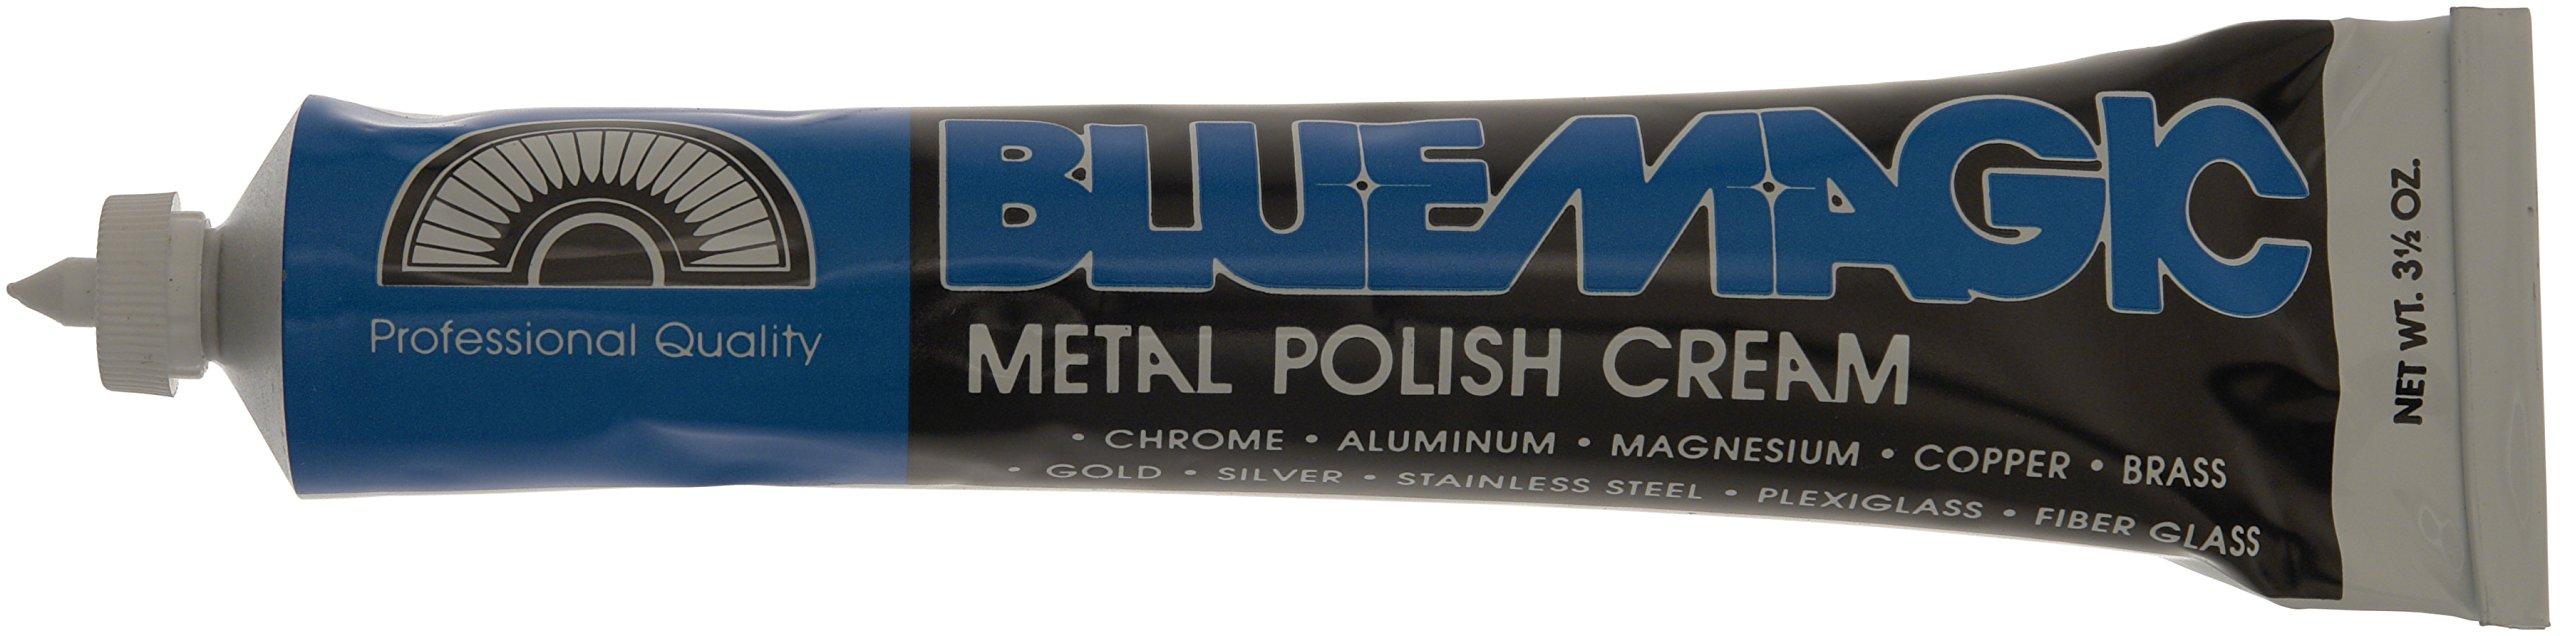 Blue Magic 100 Metal Polish Cream - 3.5 oz, White